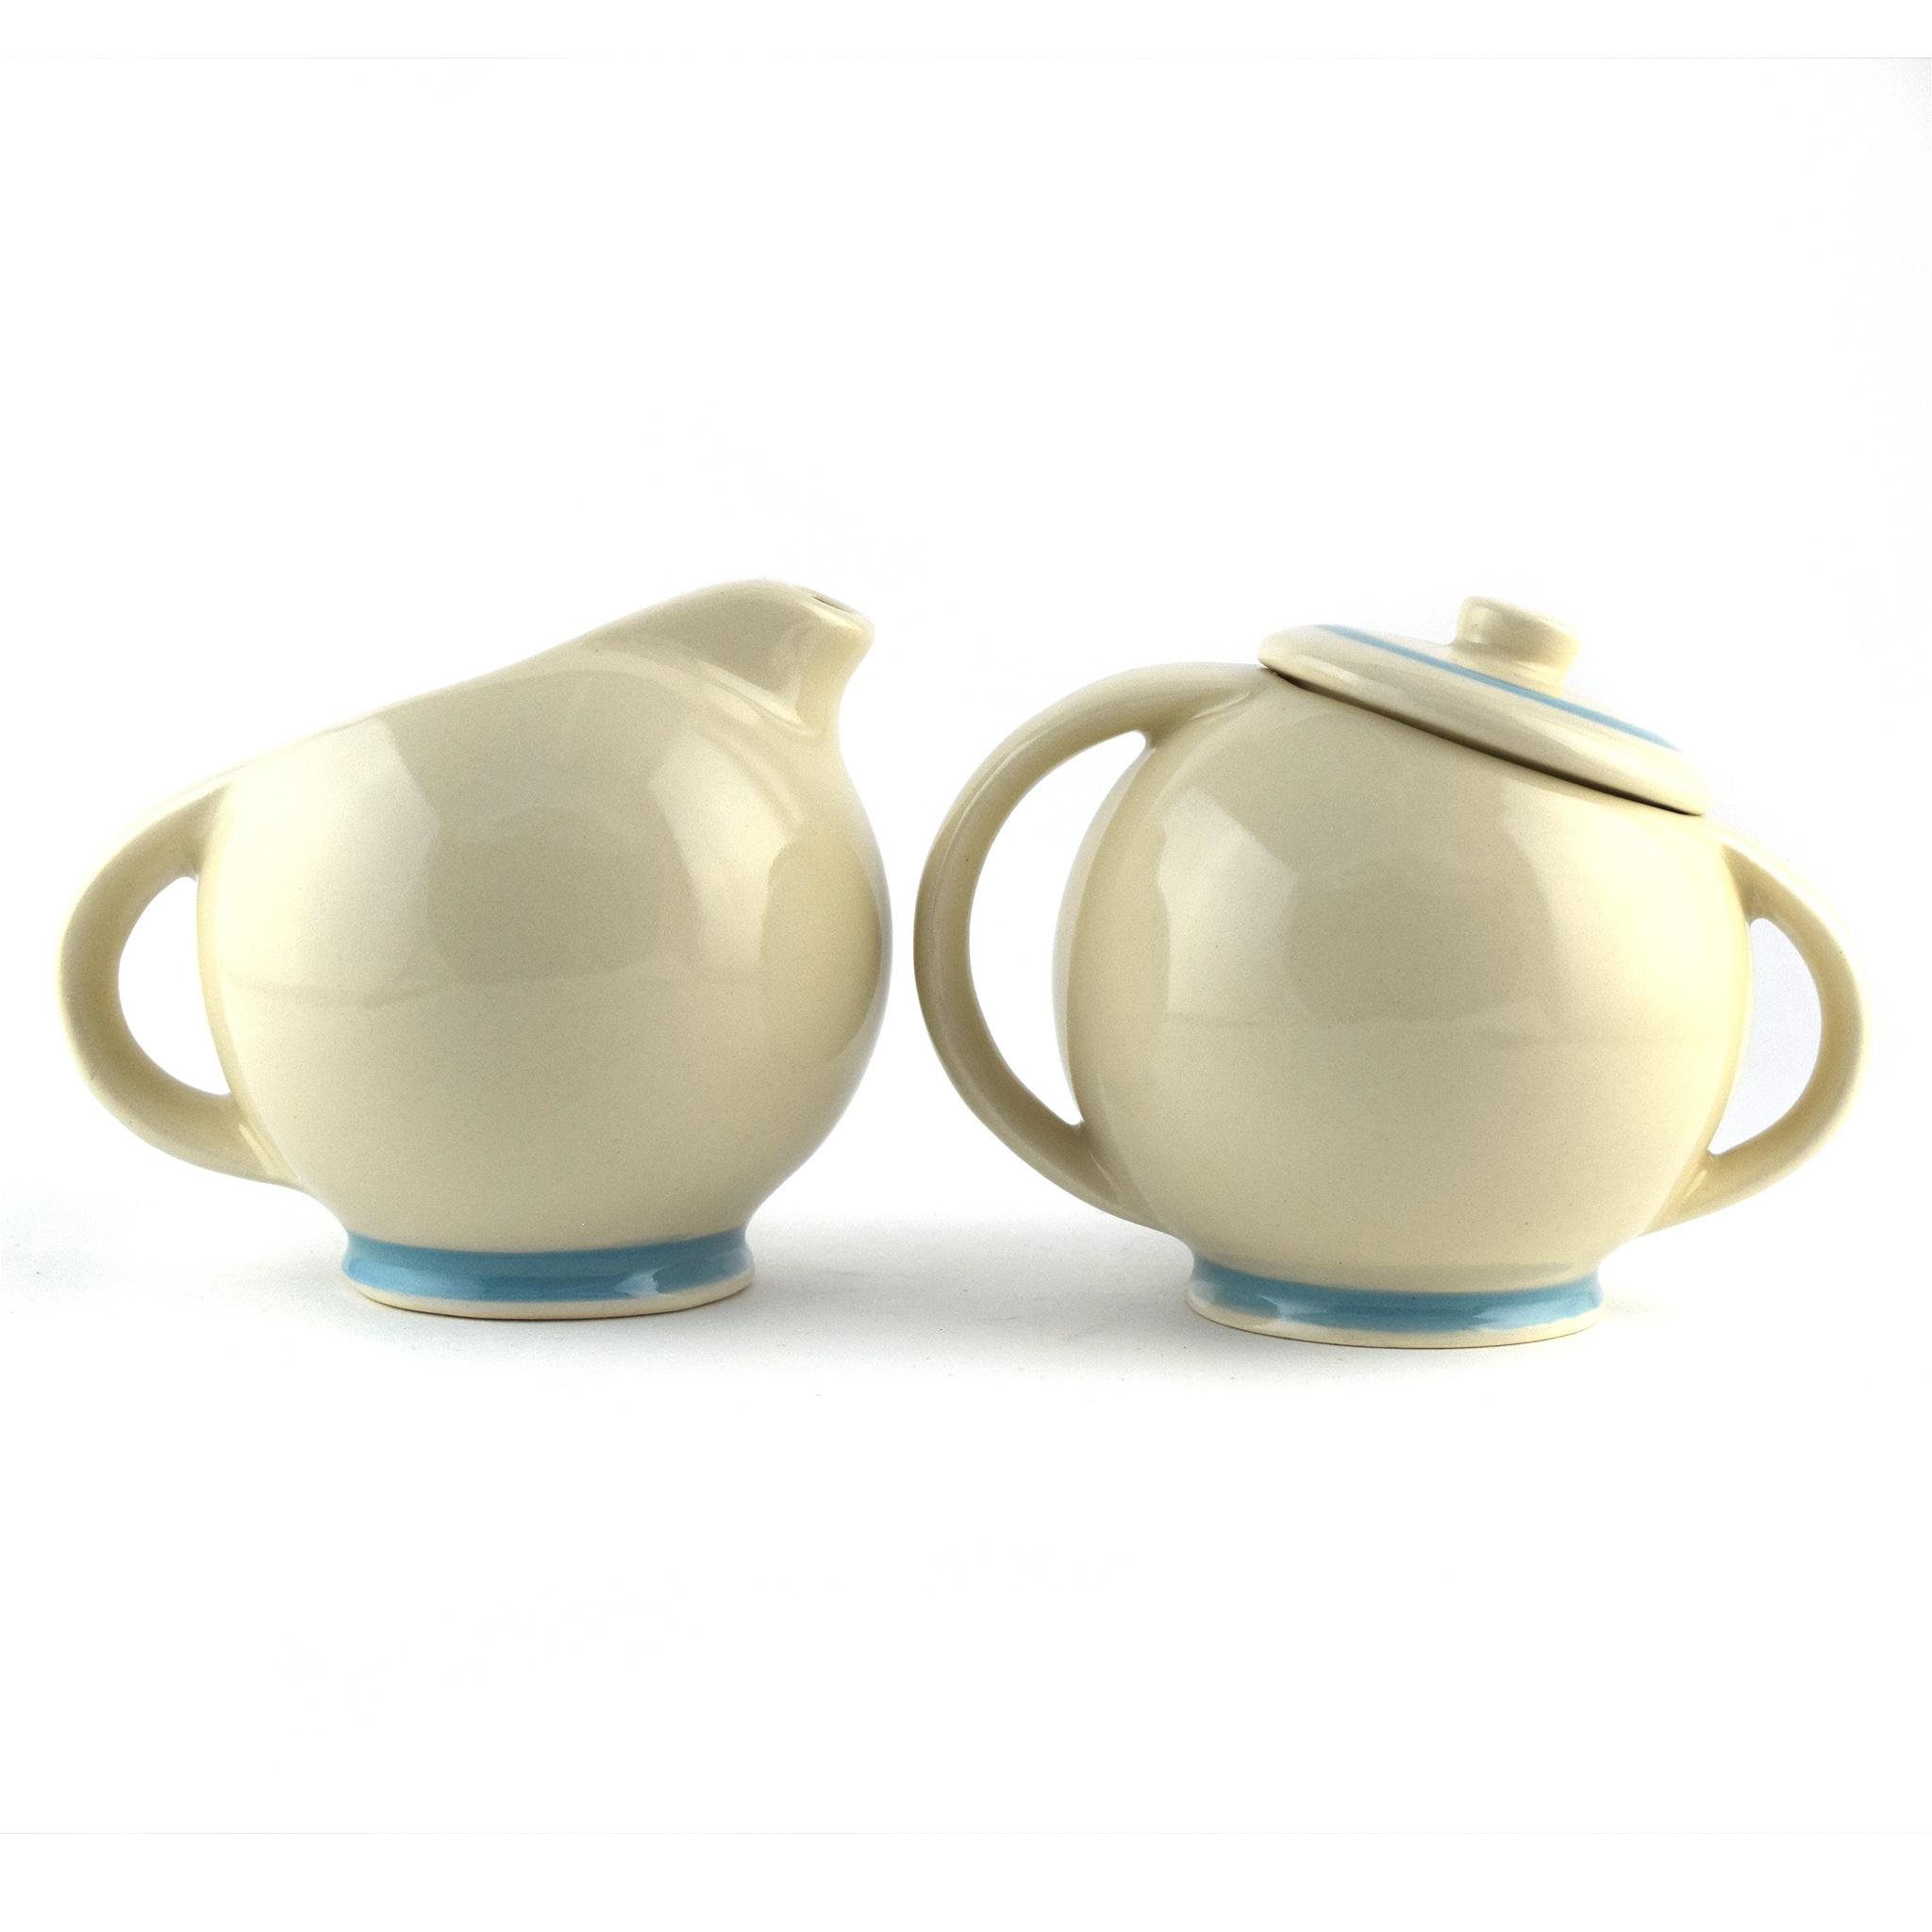 Medalta Ware Reproduction Slanted Cream & Sugar Set